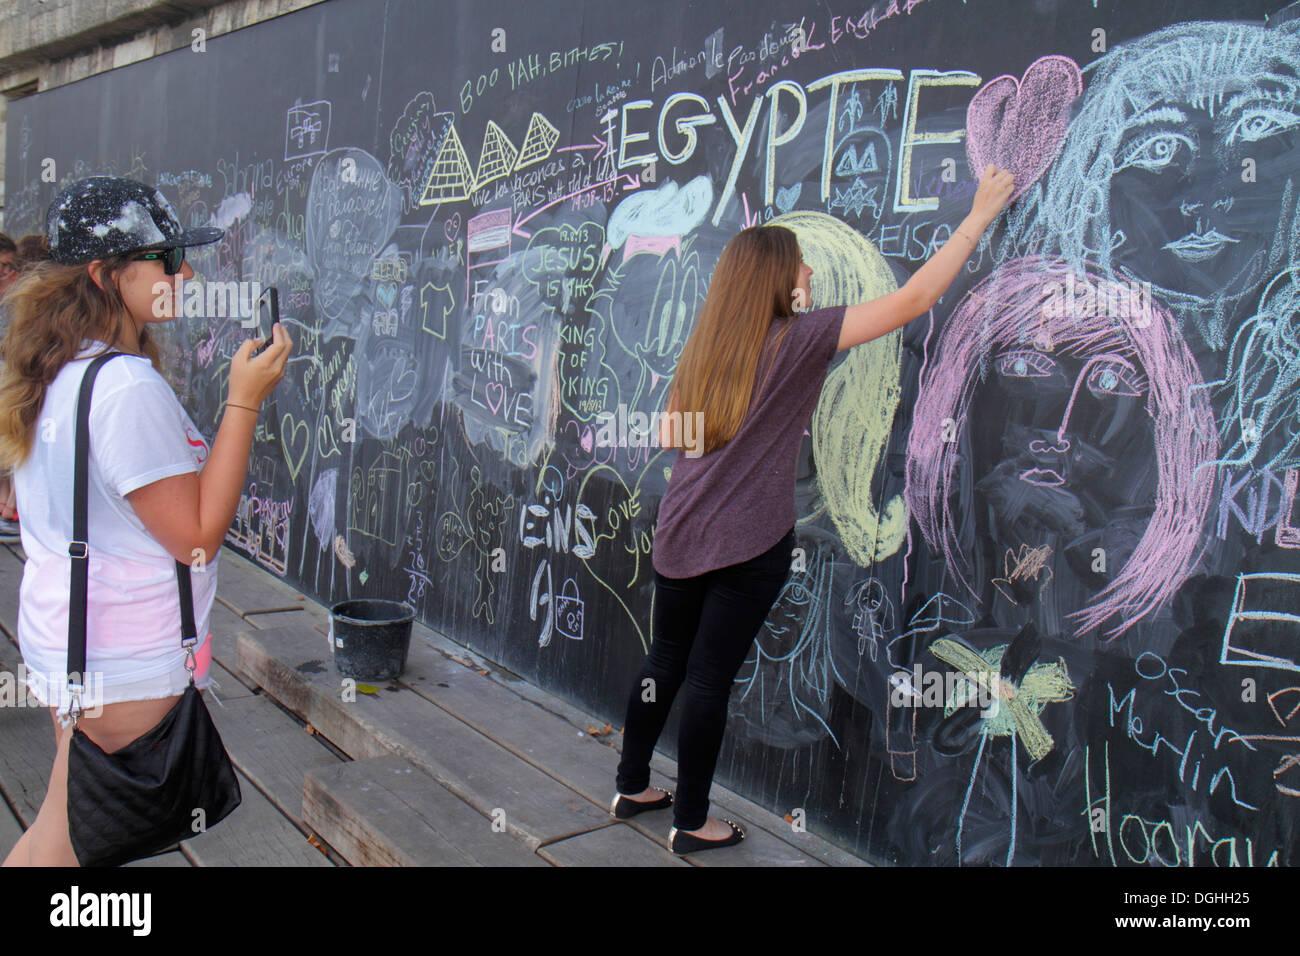 Paris France Europe French Seine River La Rive Gauche Left Bank Berges de Seine teen girl friends drawing giant chalkboard commu - Stock Image